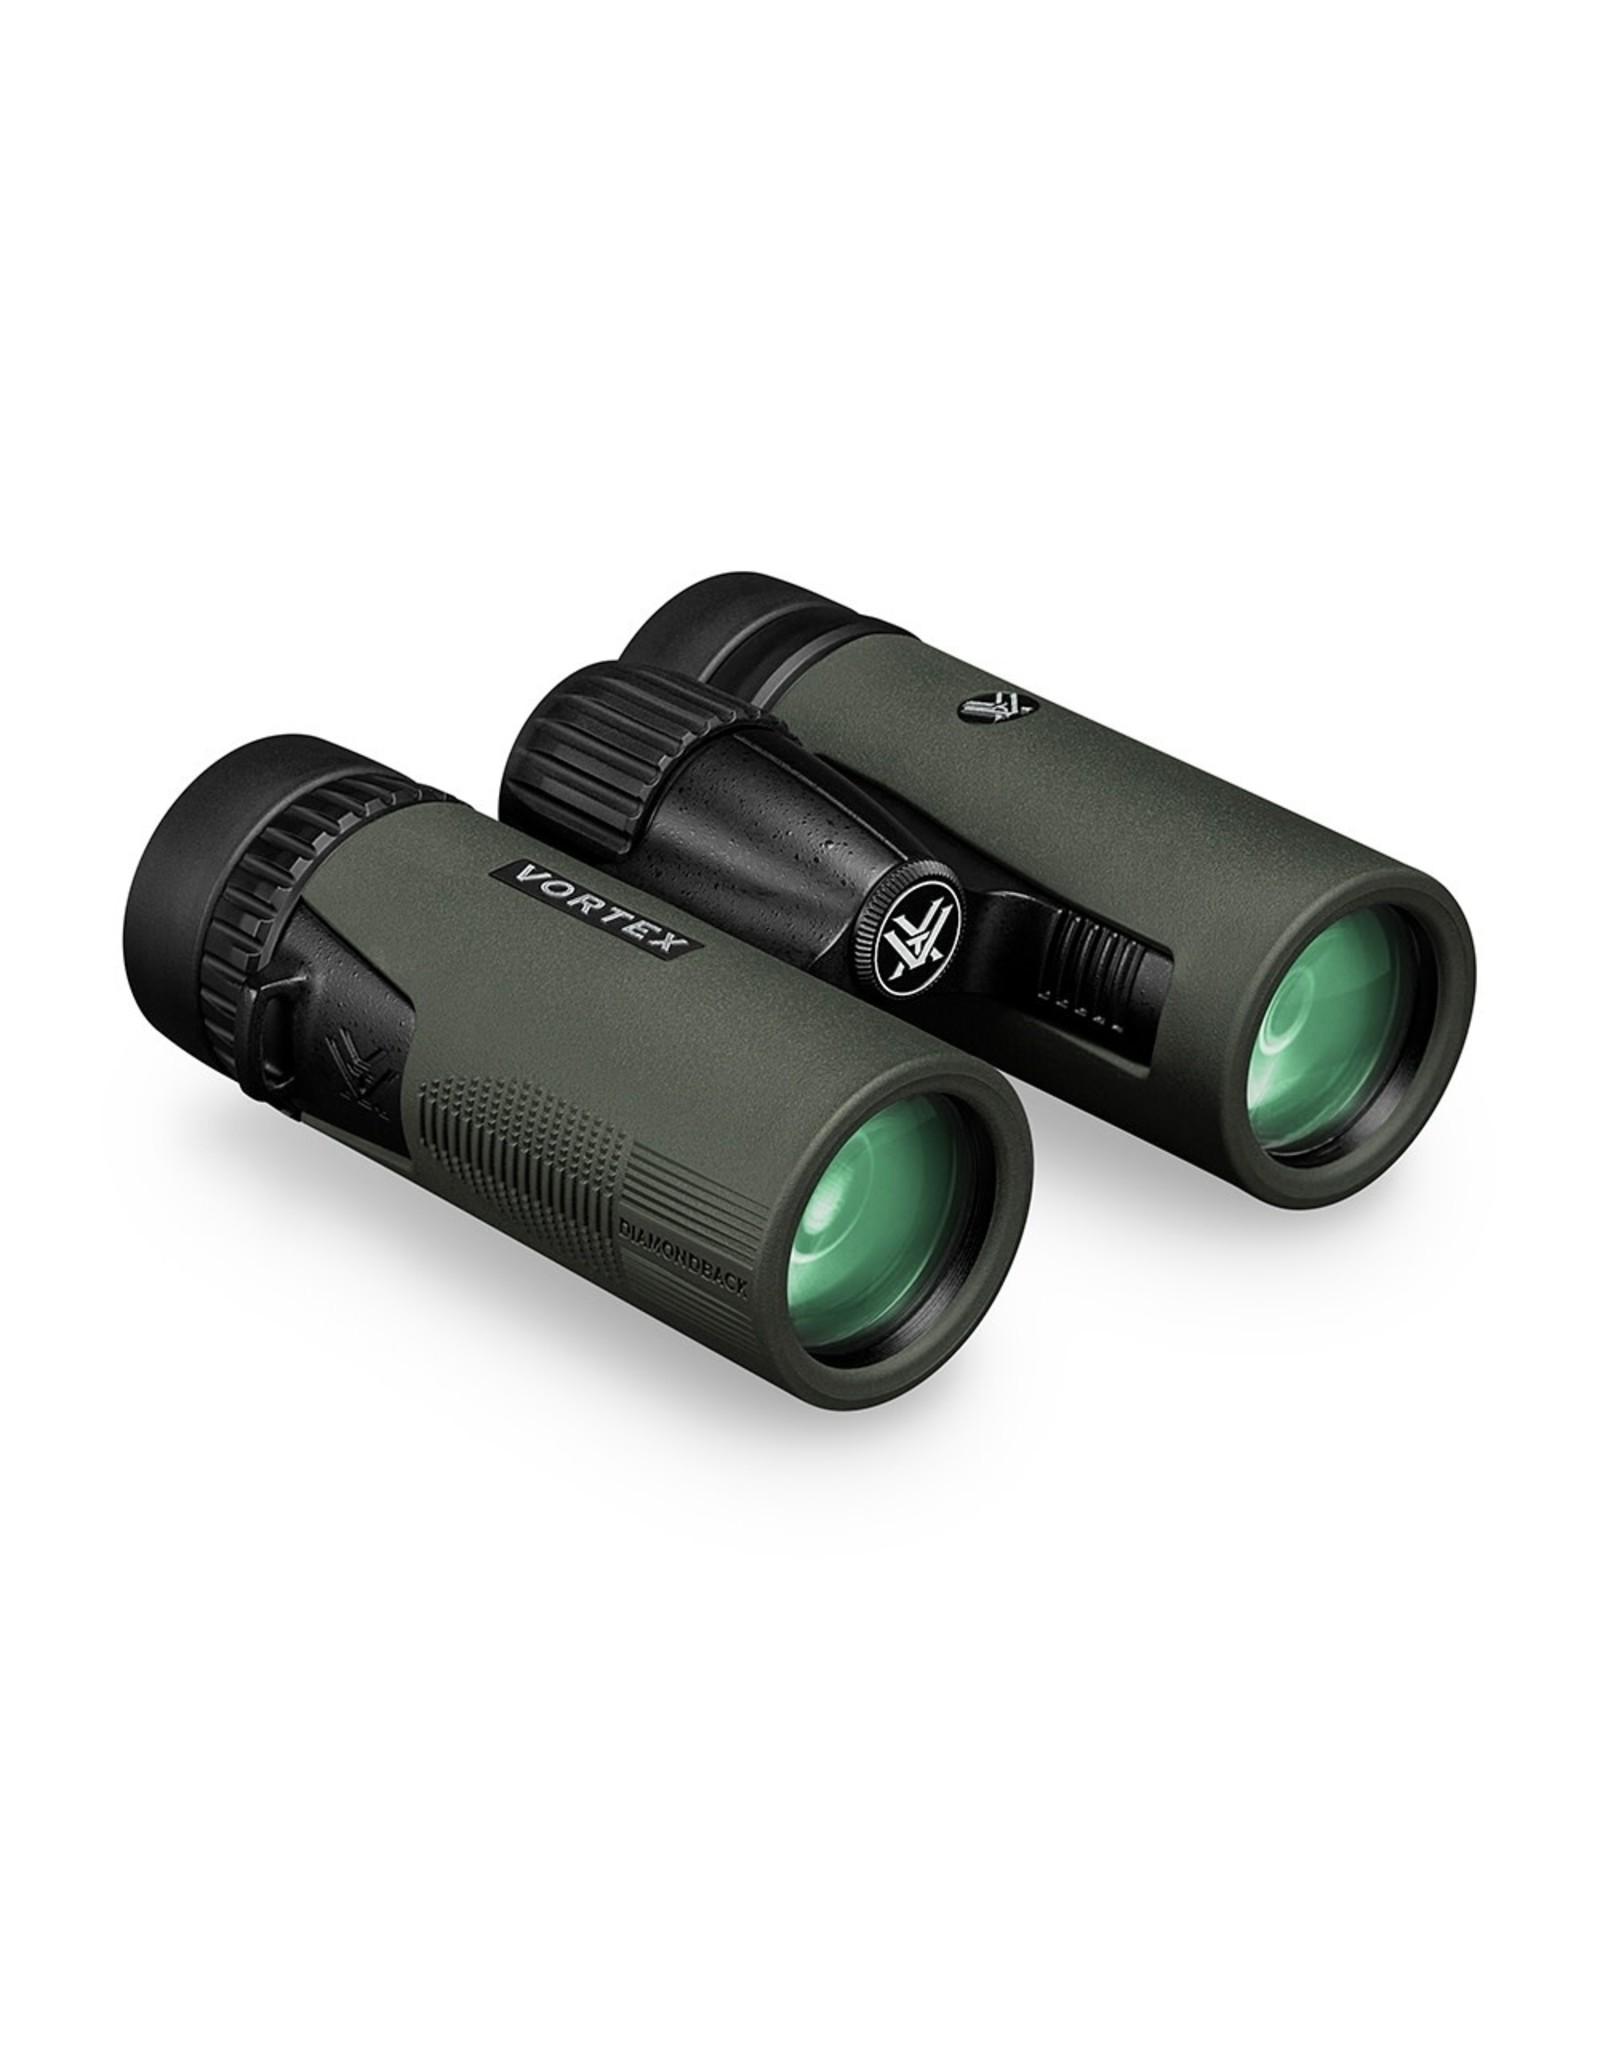 Vortex Optics VT-DB213 Vortex Diamondback HD 10x32 Binoculars